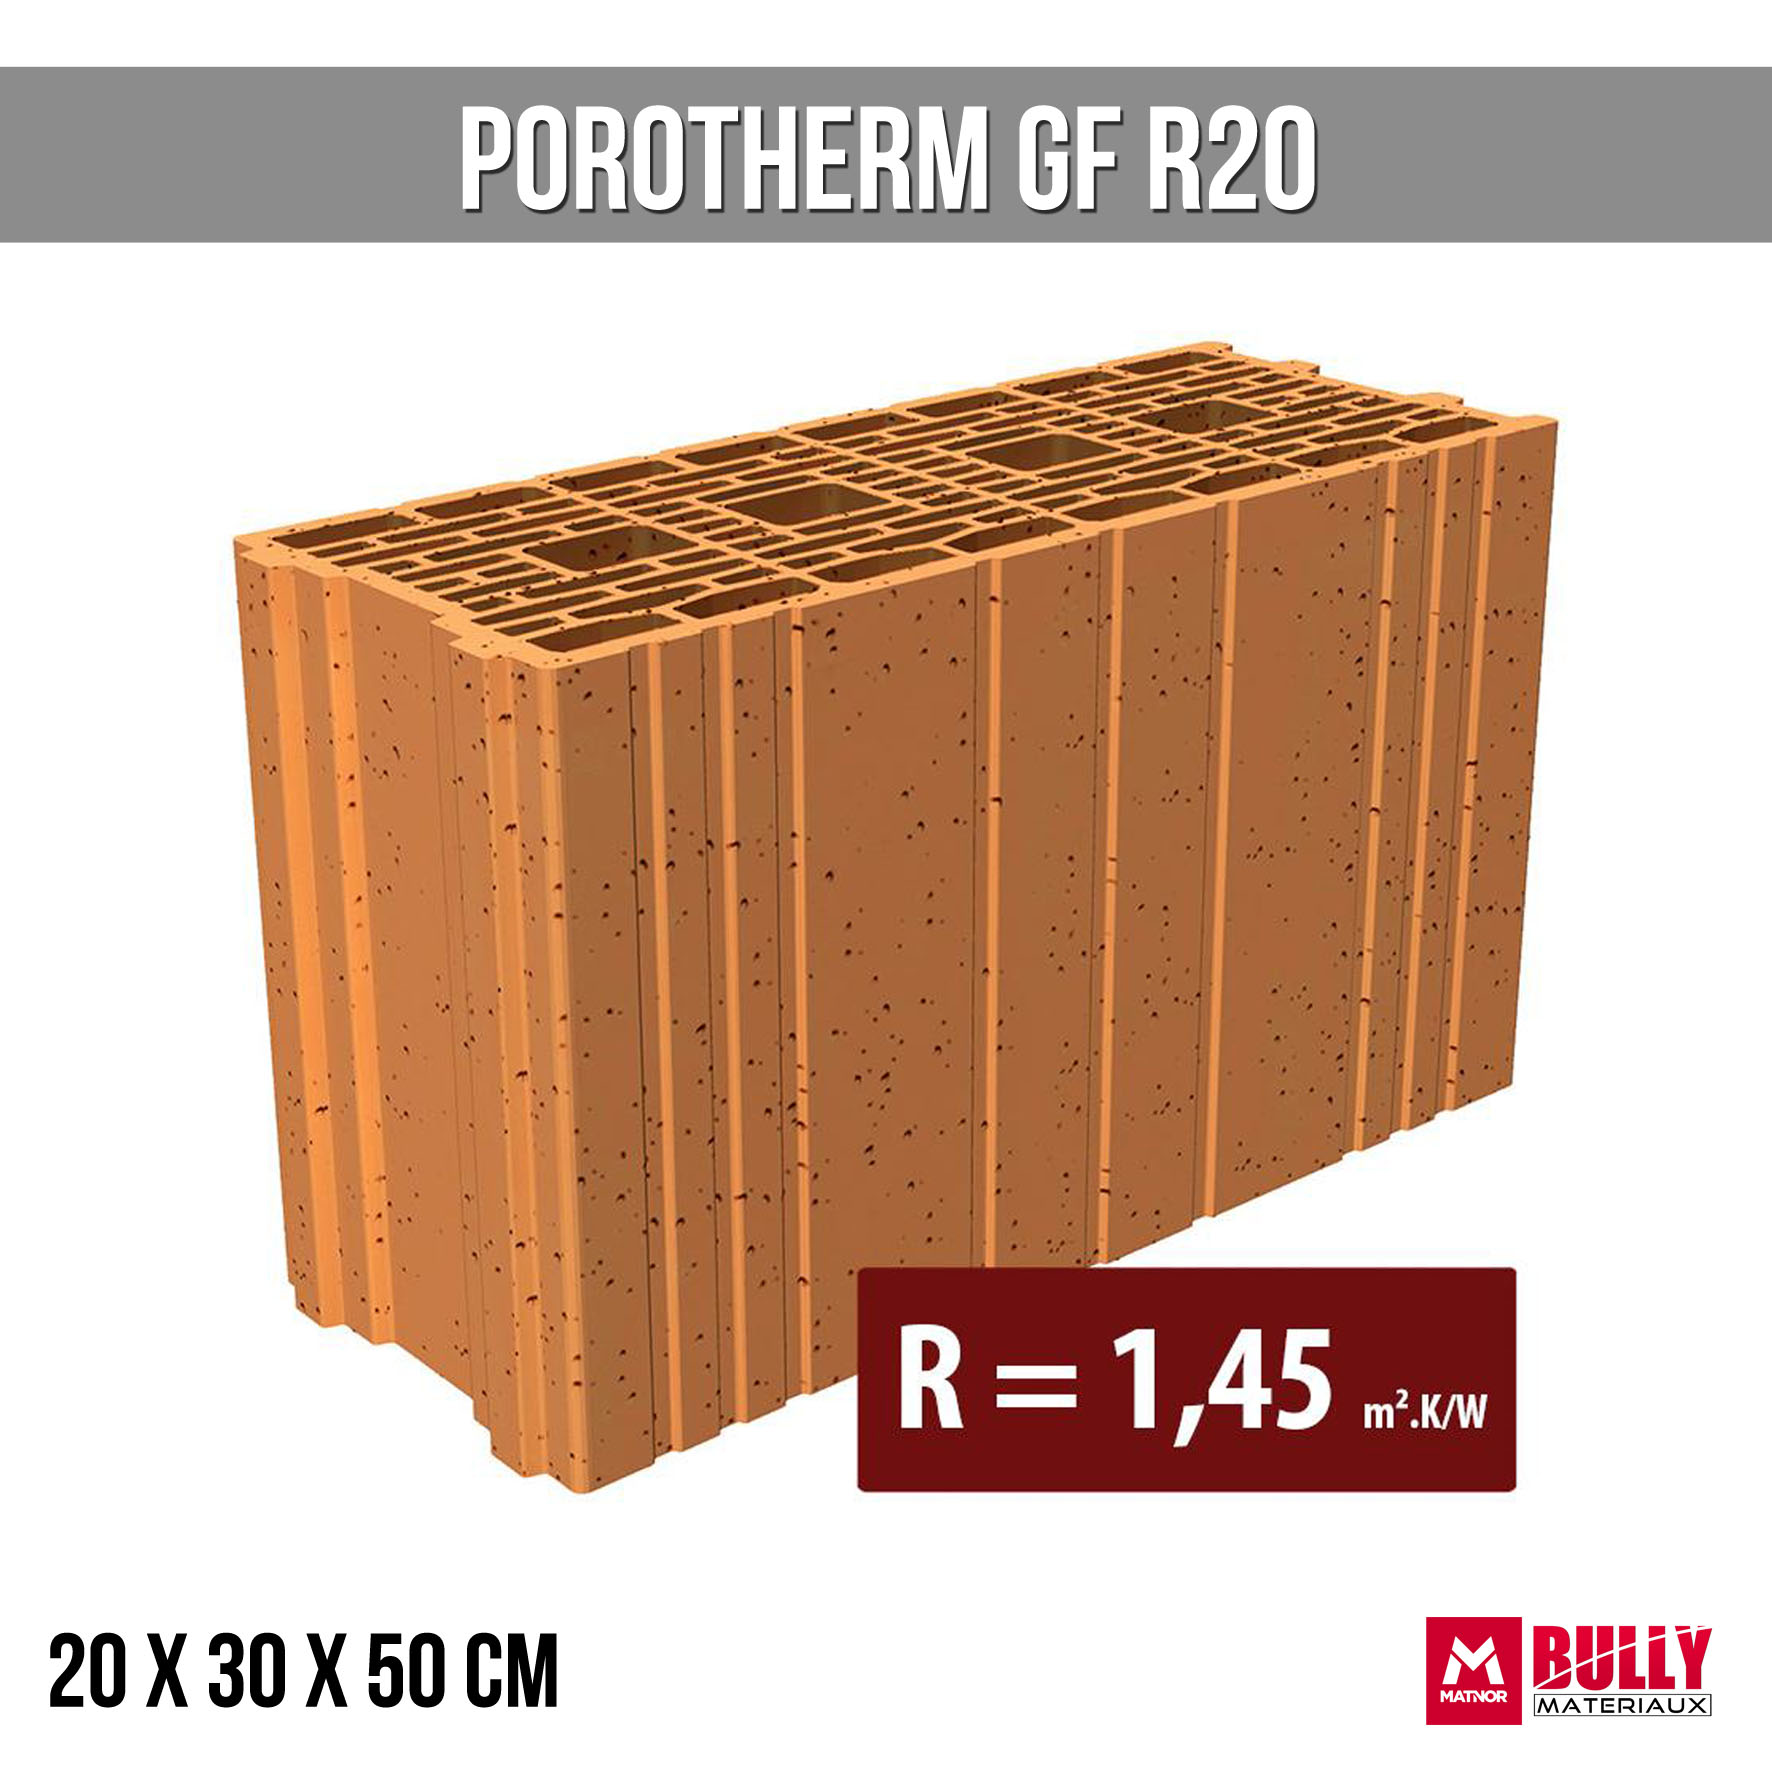 Porothem gf r20